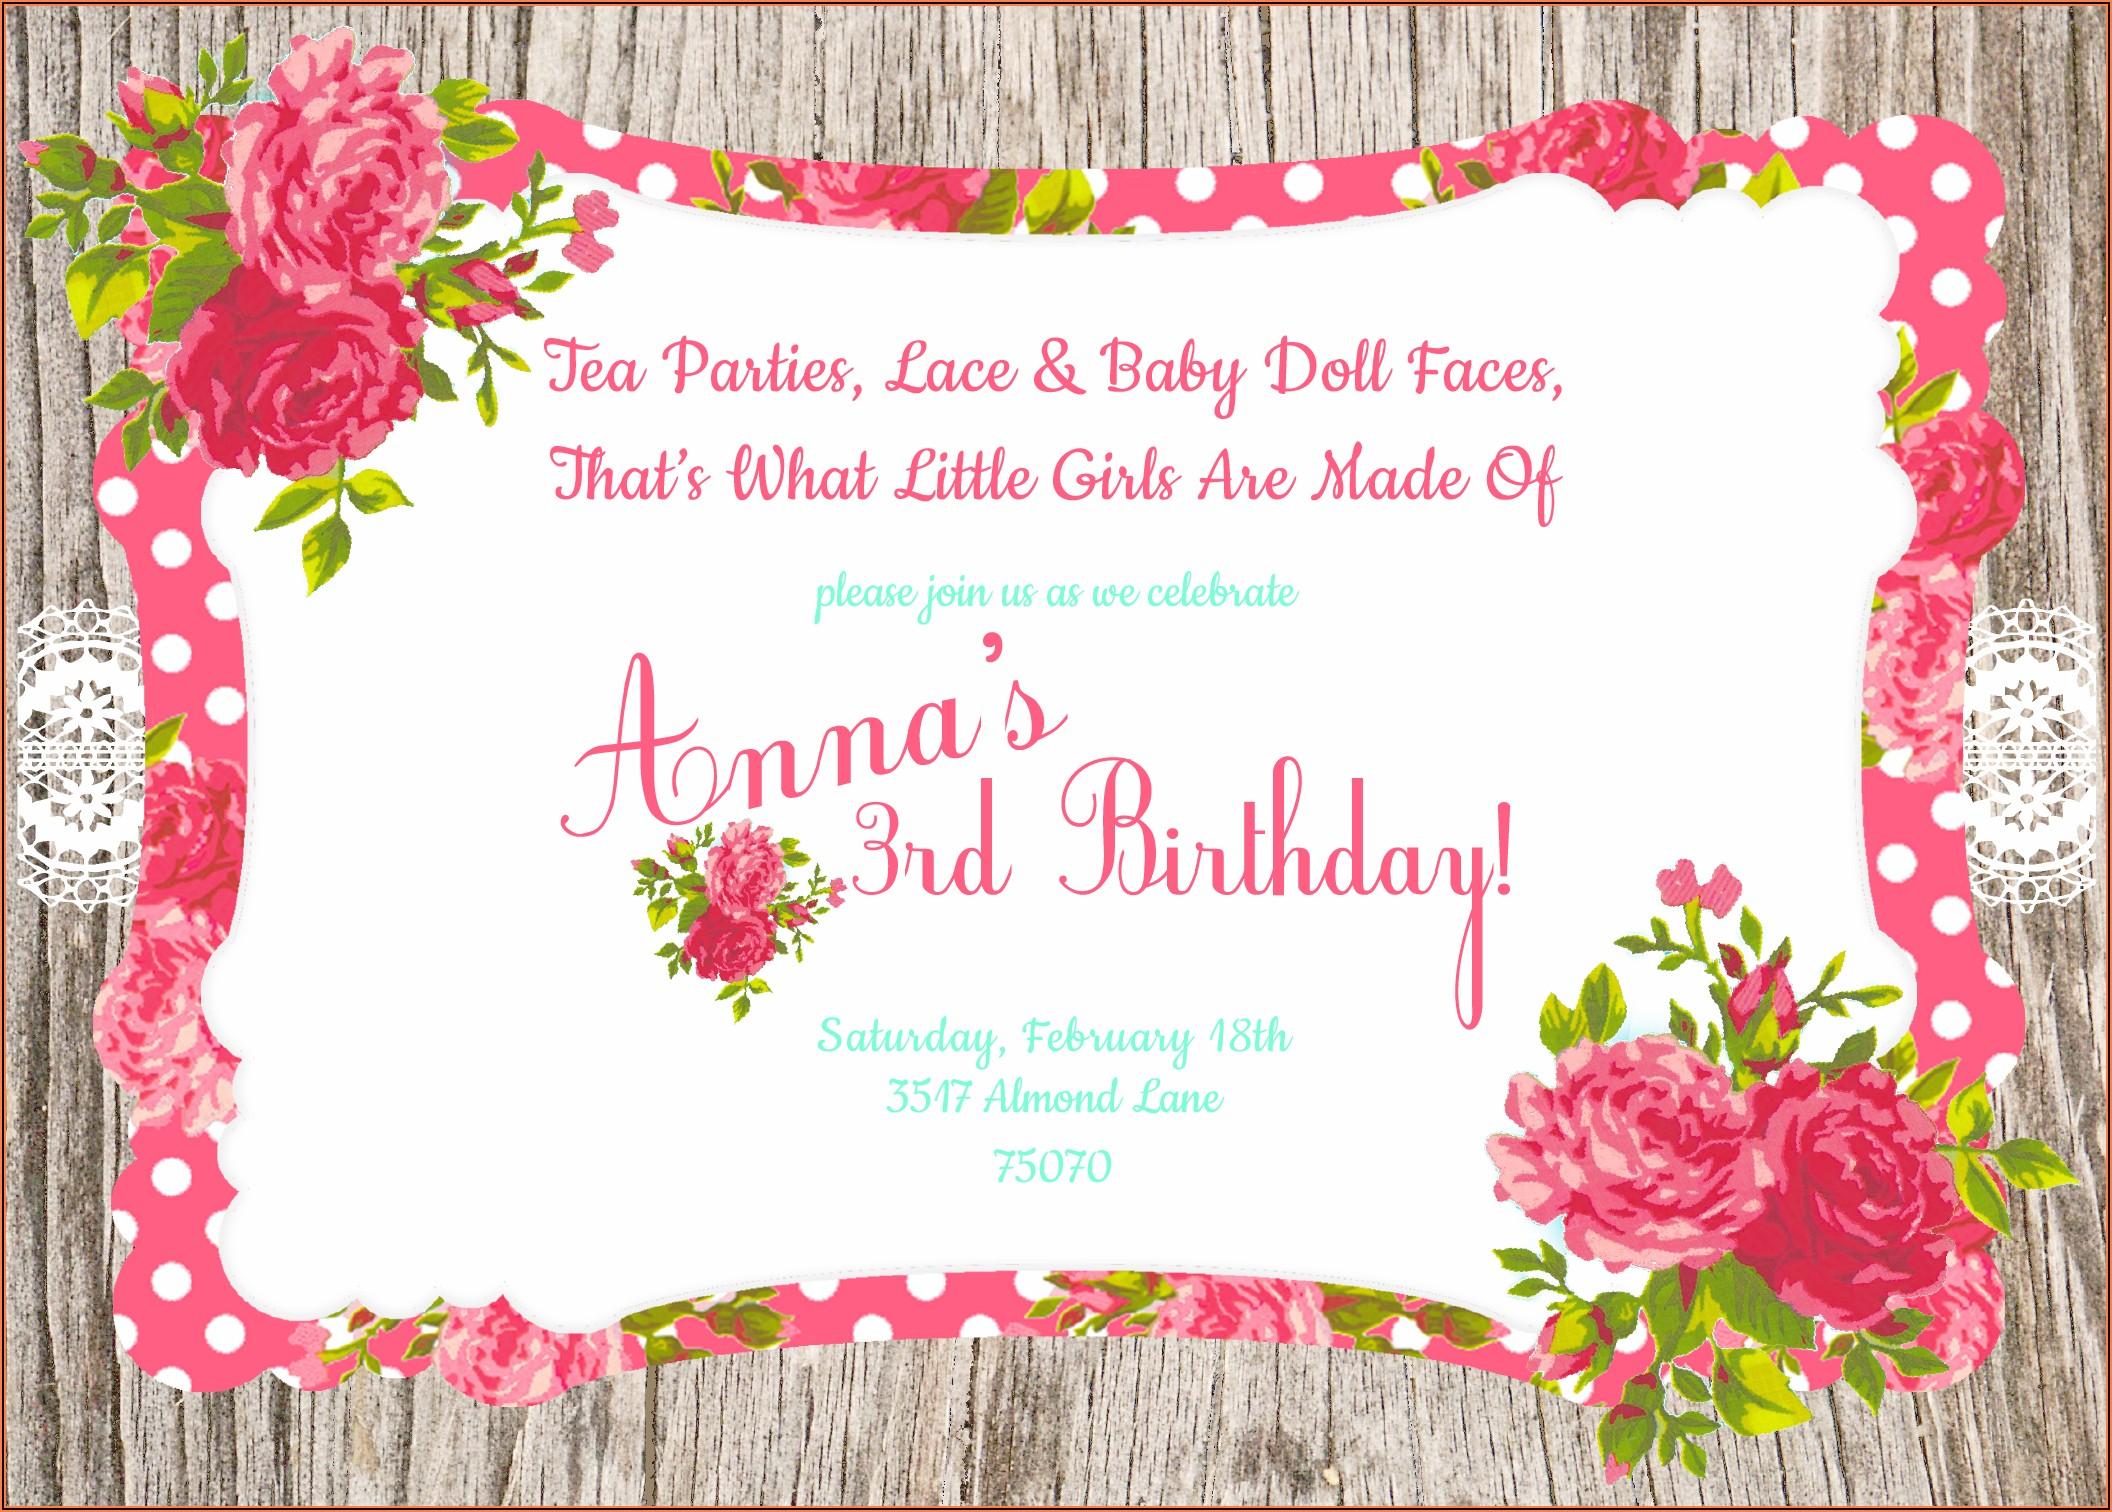 1st Birthday Invitation Card Png